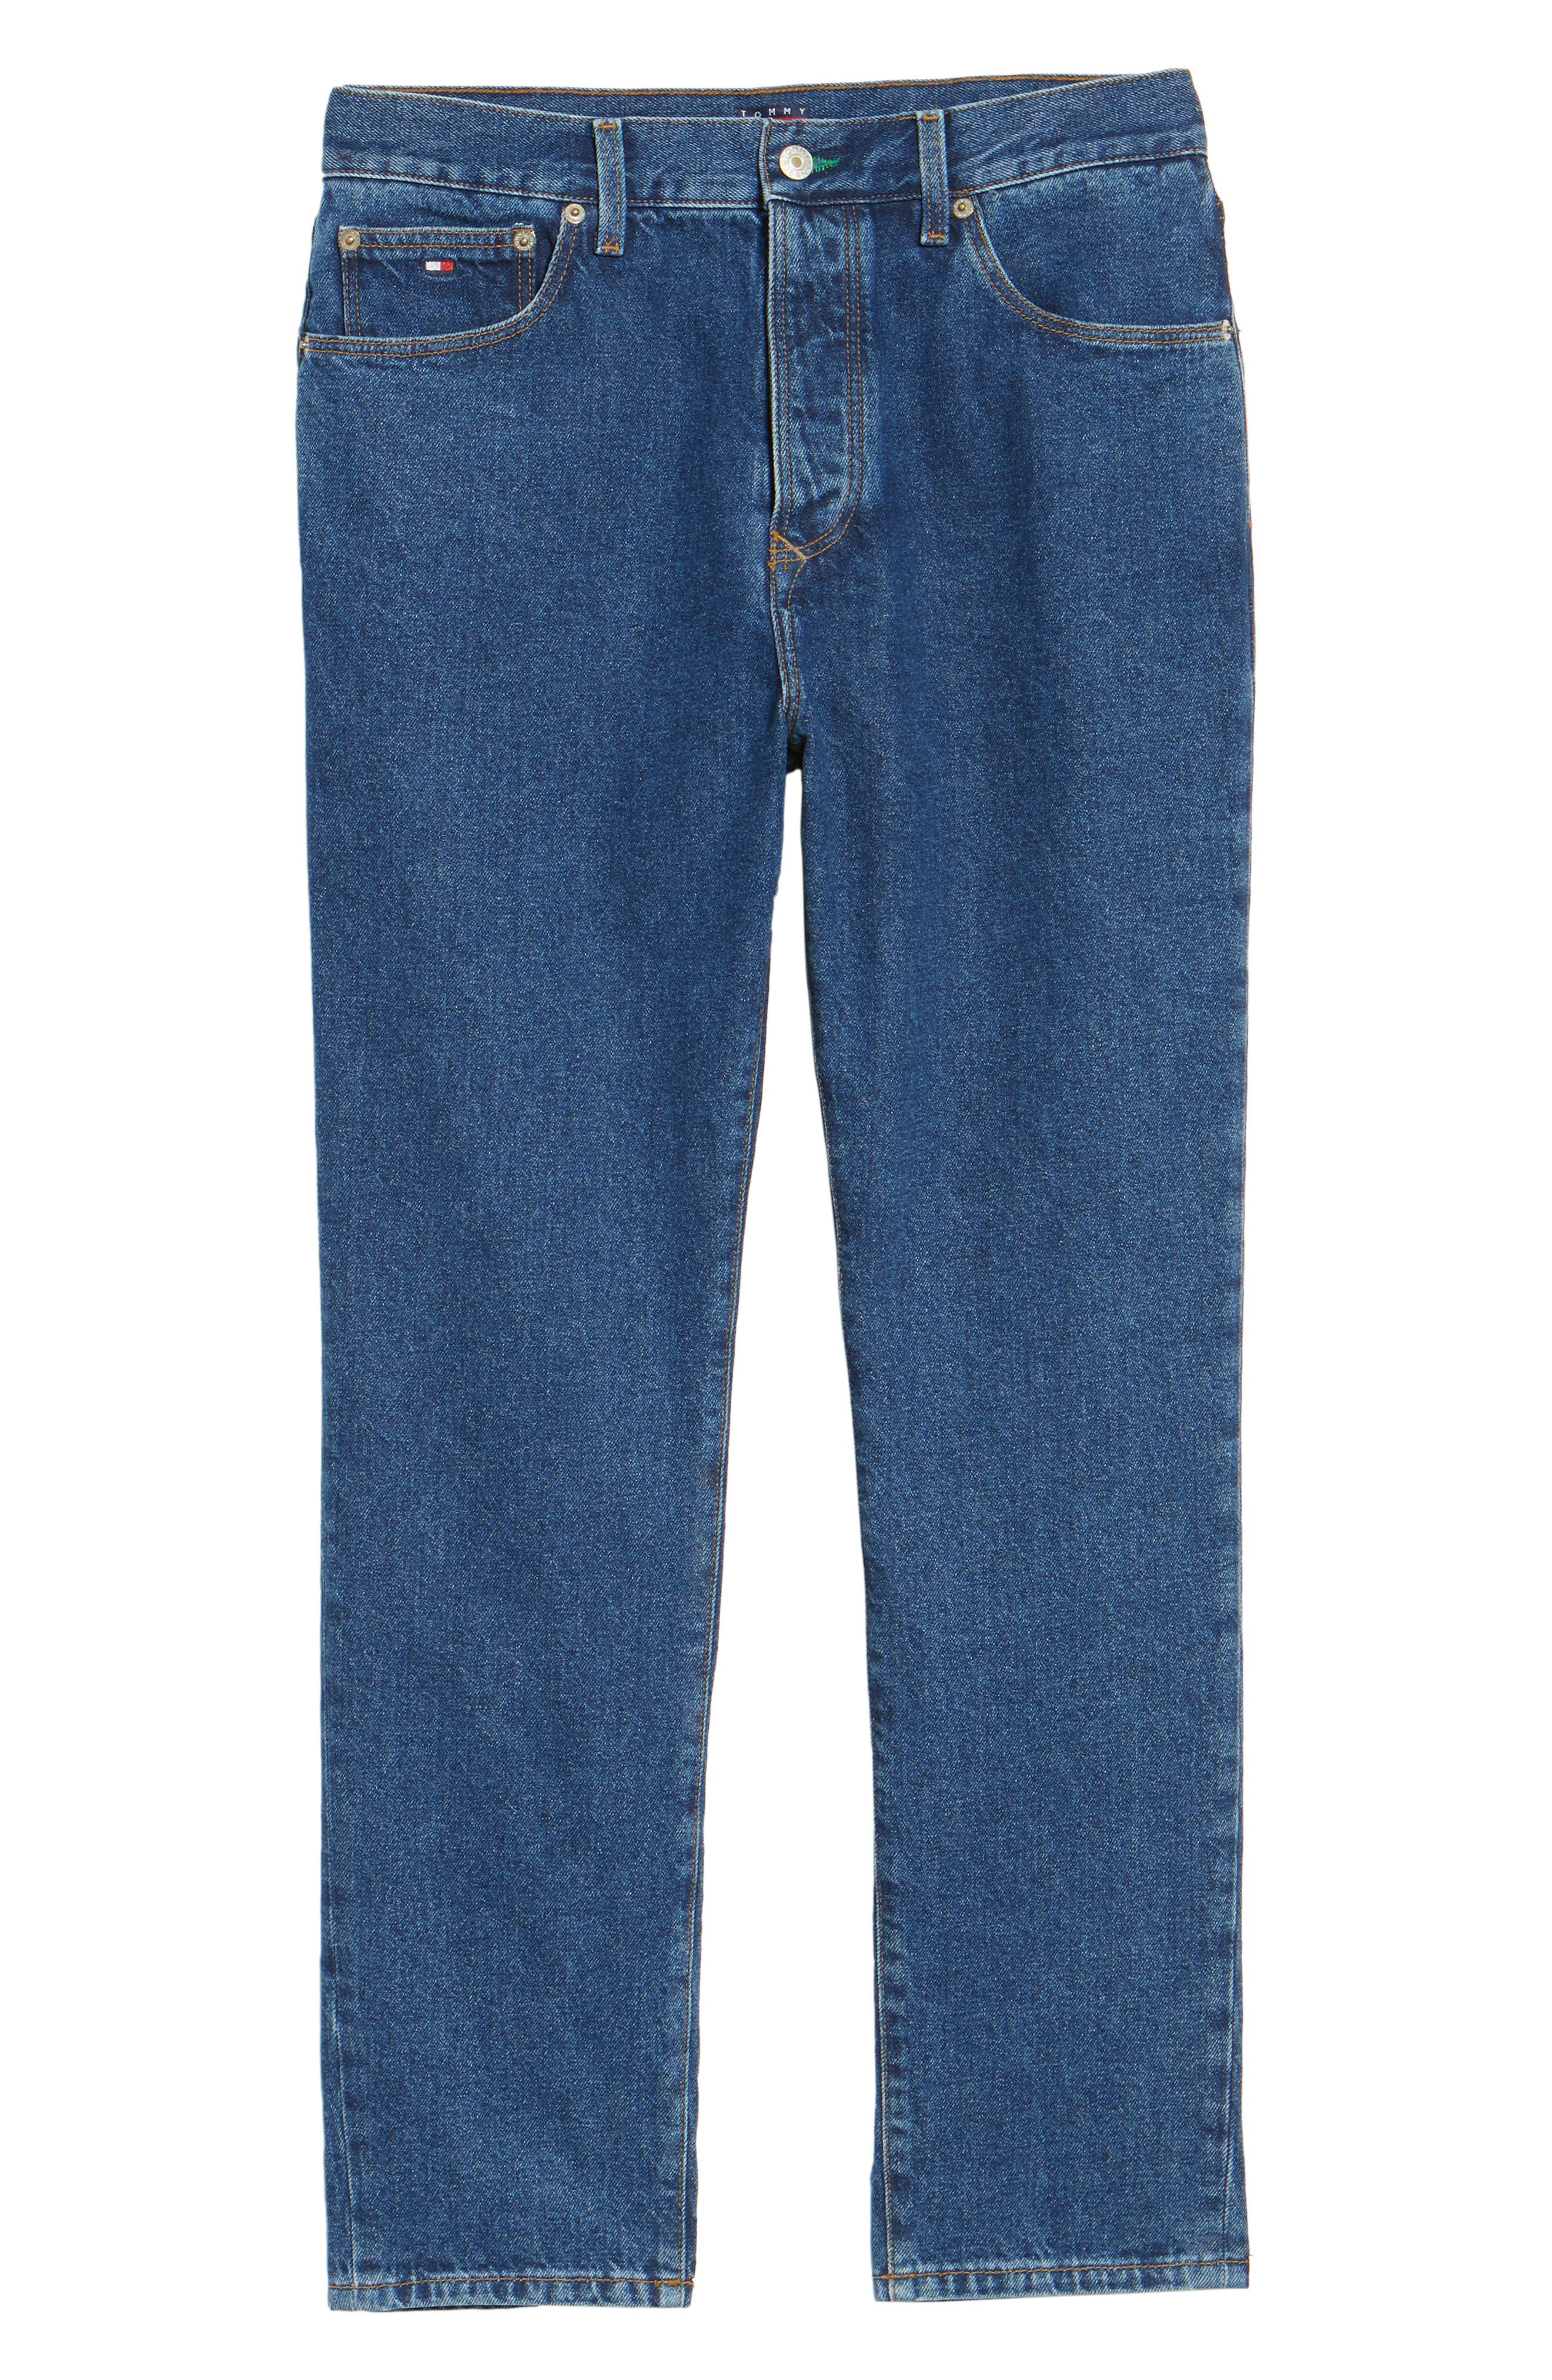 90s Classic Straight Leg Jeans,                             Alternate thumbnail 24, color,